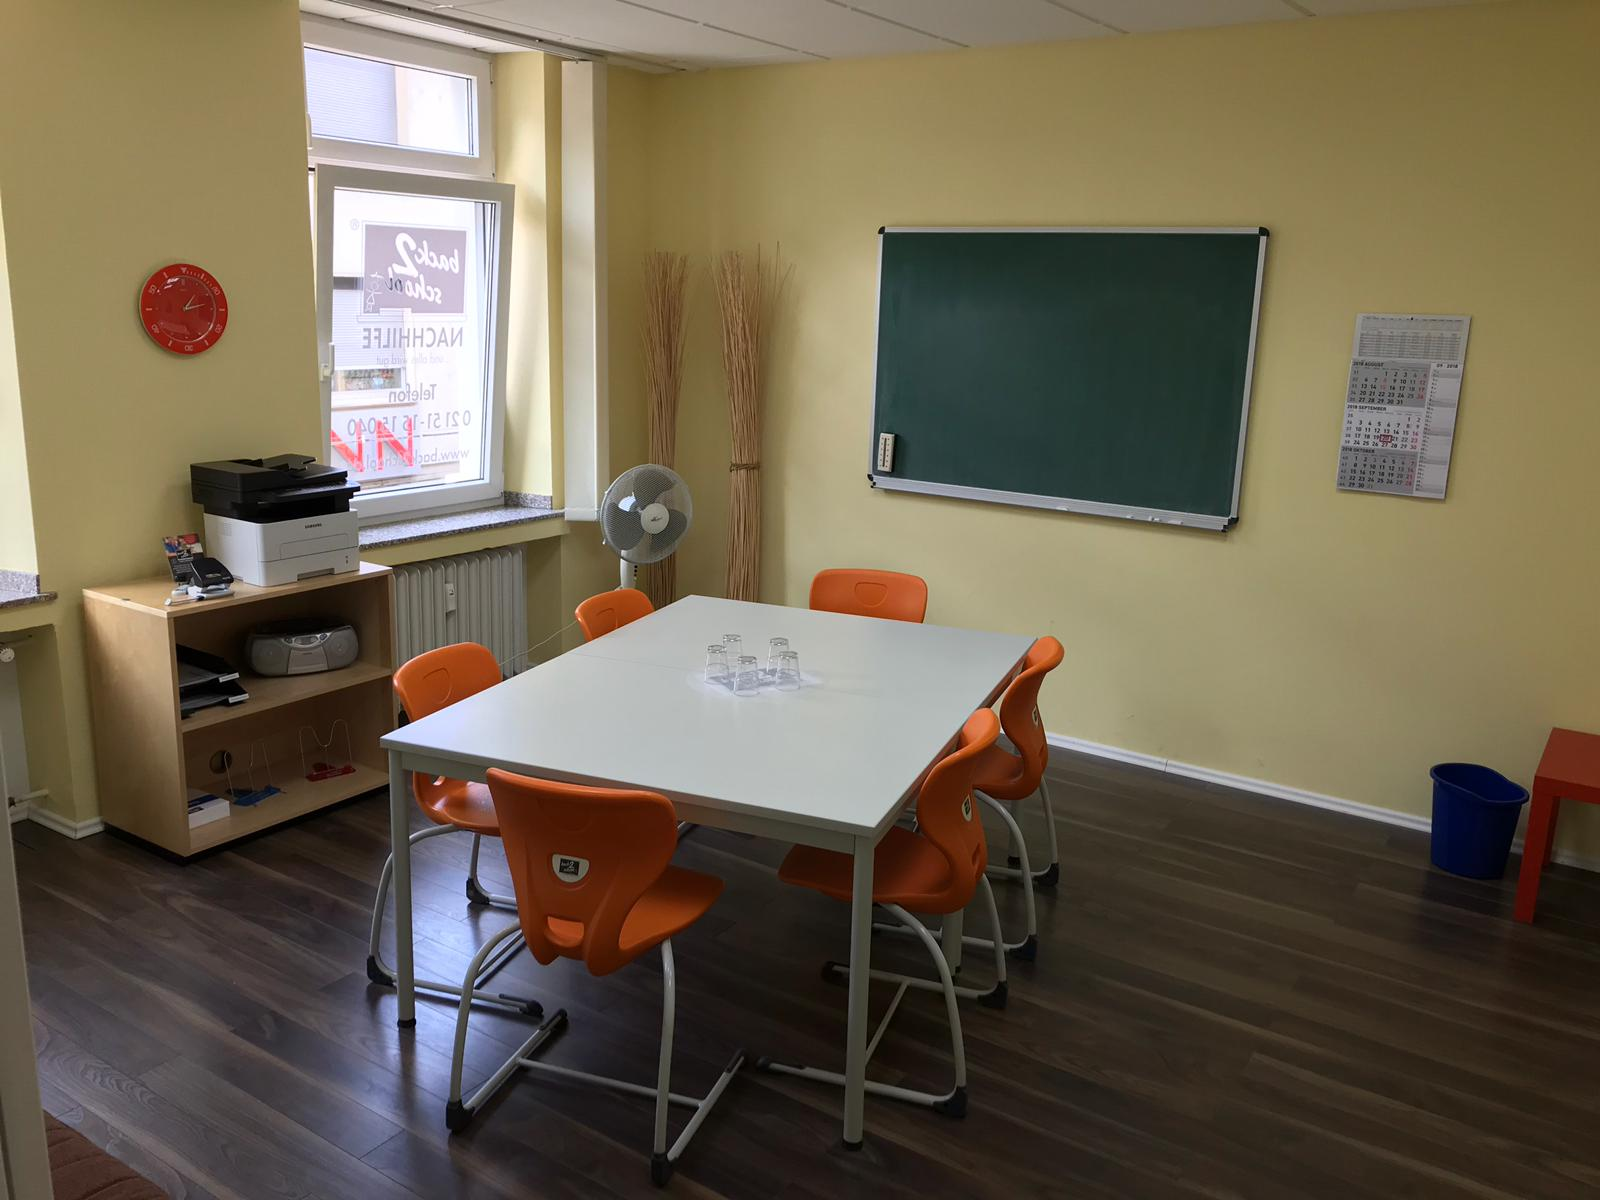 Klassenraum Unterrichtsraum back2school Nachhilfe Krefeld Uerdingen Nachhilfeinstitut in Krefeld